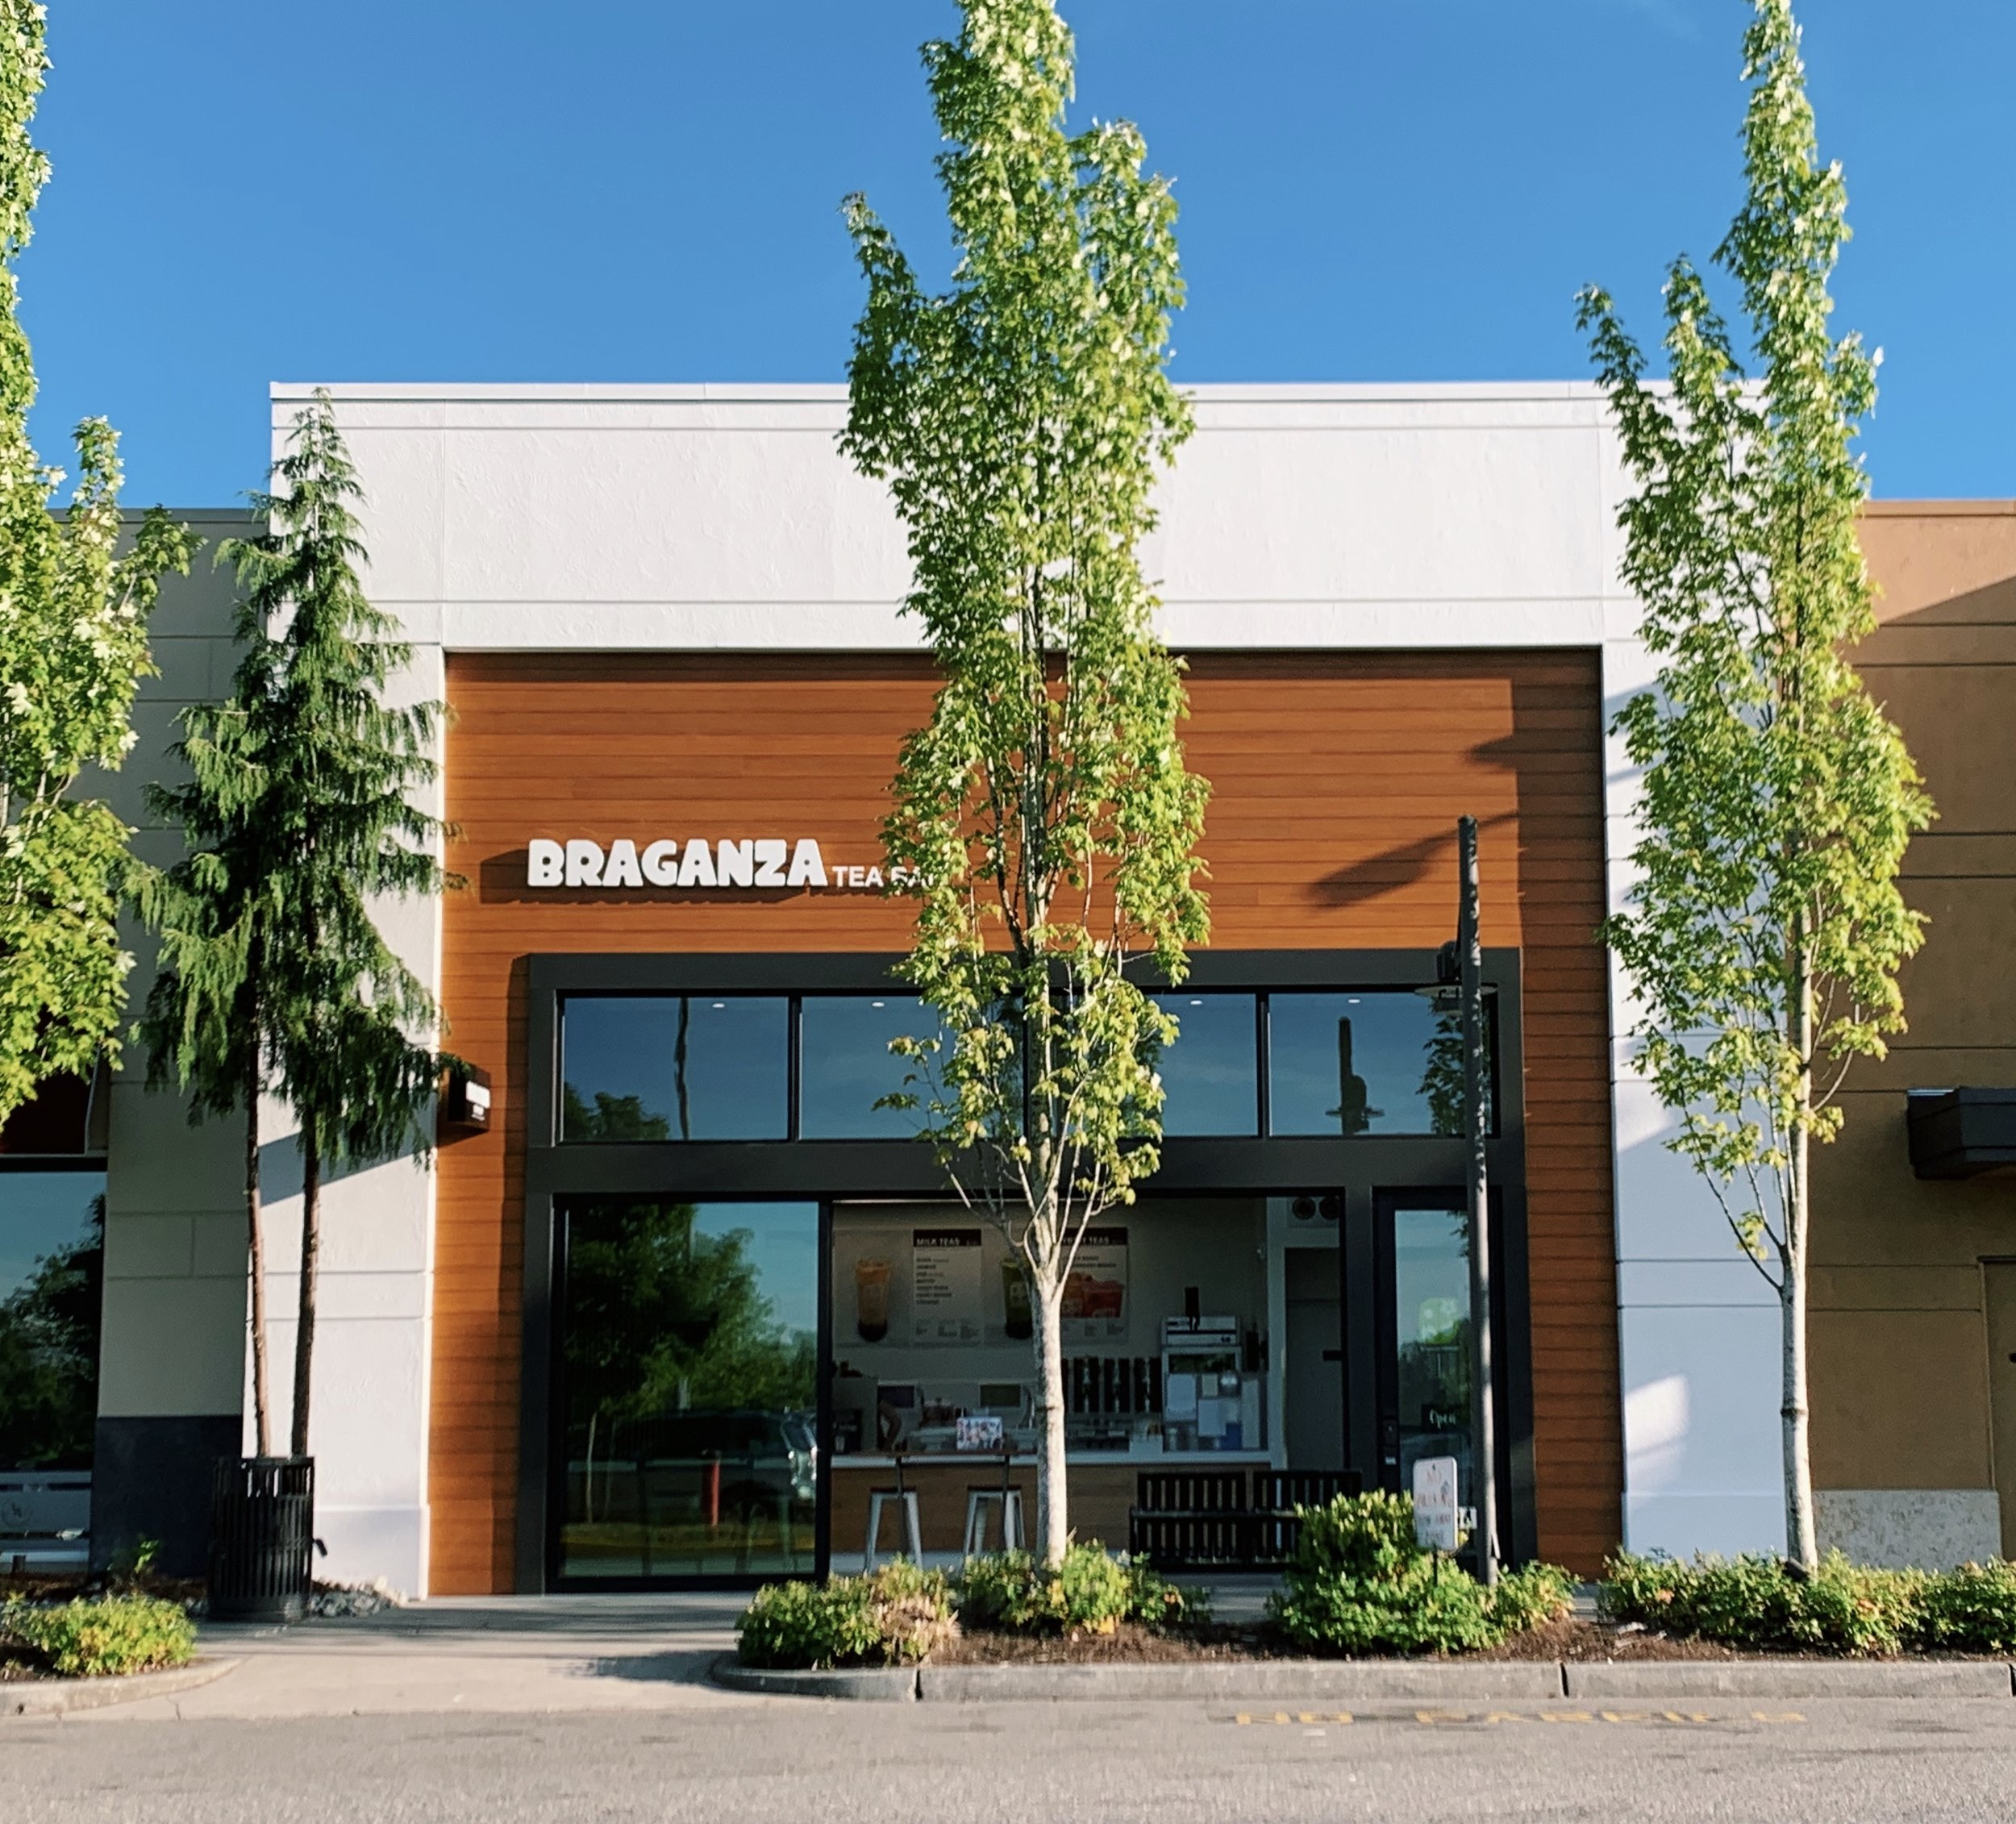 Braganza Tea Bar - Now open at Alderwood Mall in Lynnwood, Washington.